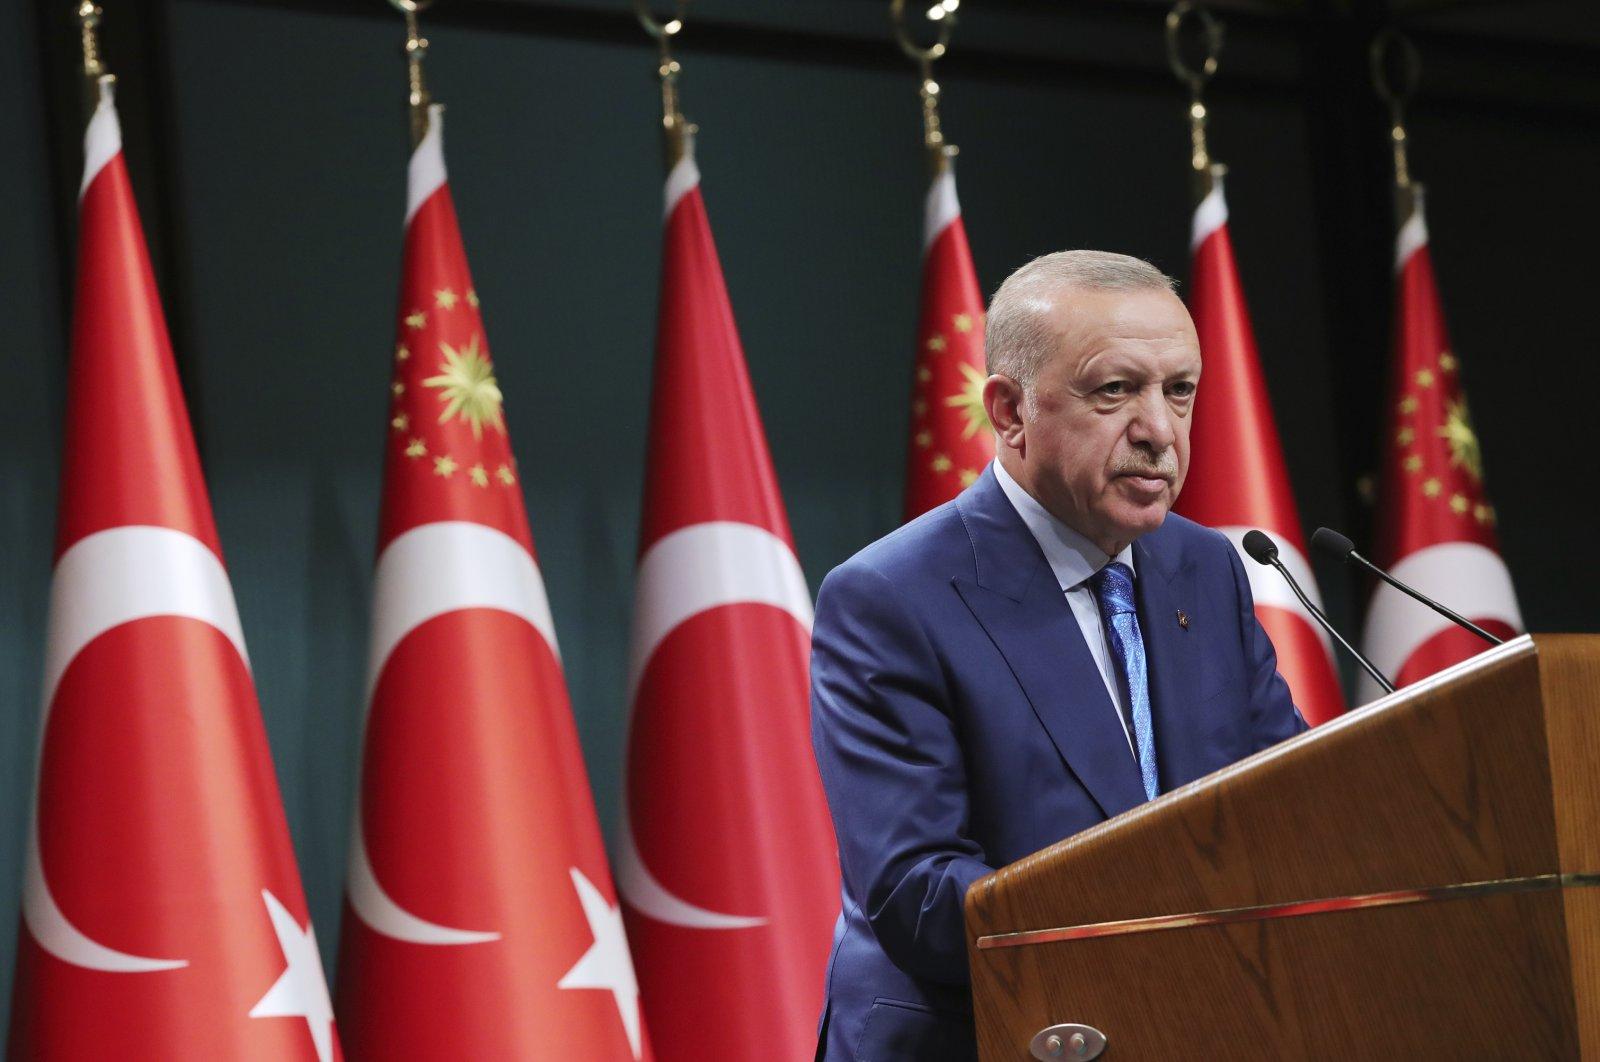 President Recep Tayyip Erdogan speaks during a televised address following a Cabinet meeting, in Ankara, Turkey, Aug. 19, 2021. (Turkish Presidency via AP, Pool)